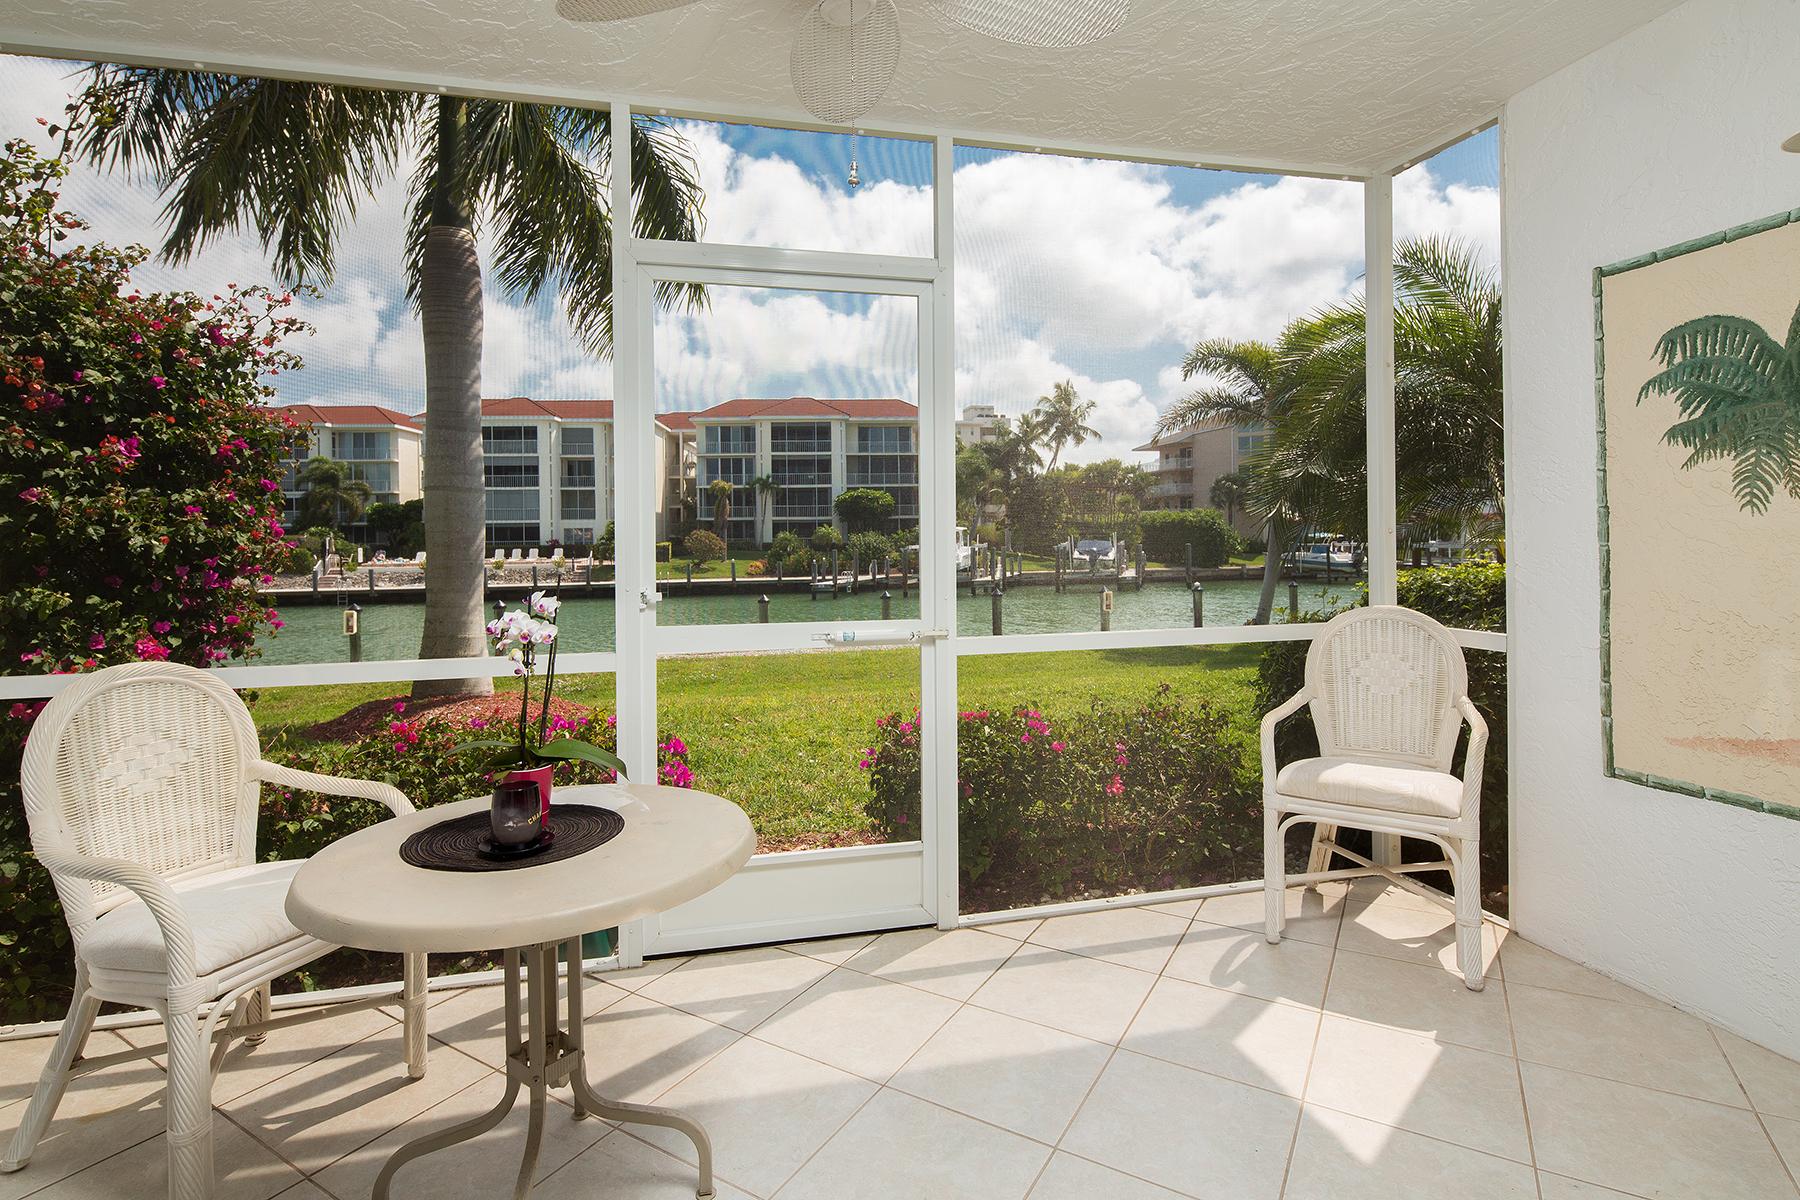 Condomínio para Venda às MARCO ISLAND 860 Panama Ct E 117 Marco Island, Florida, 34145 Estados Unidos